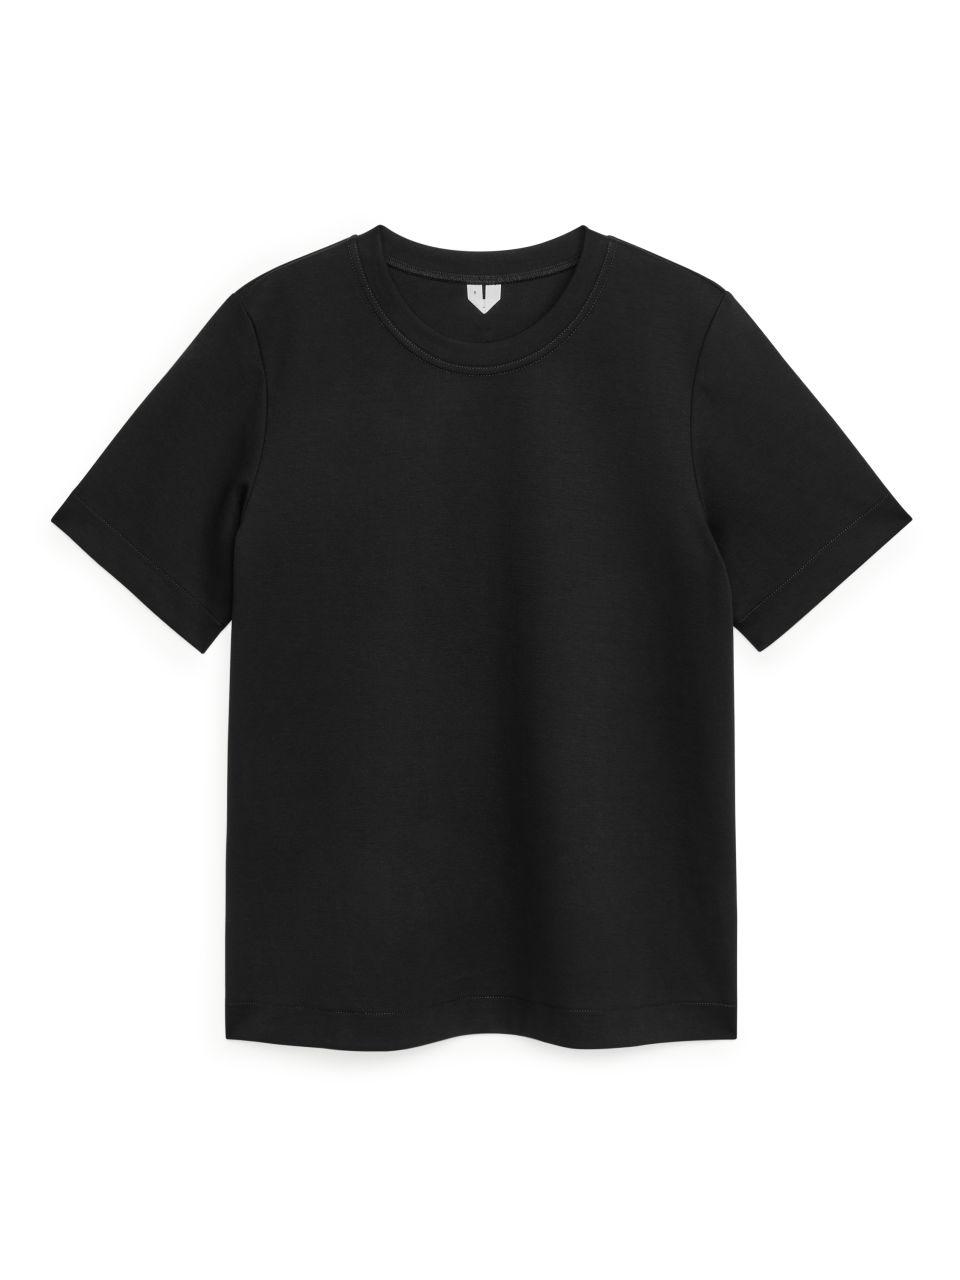 Heavy-Weight T-Shirt - Black